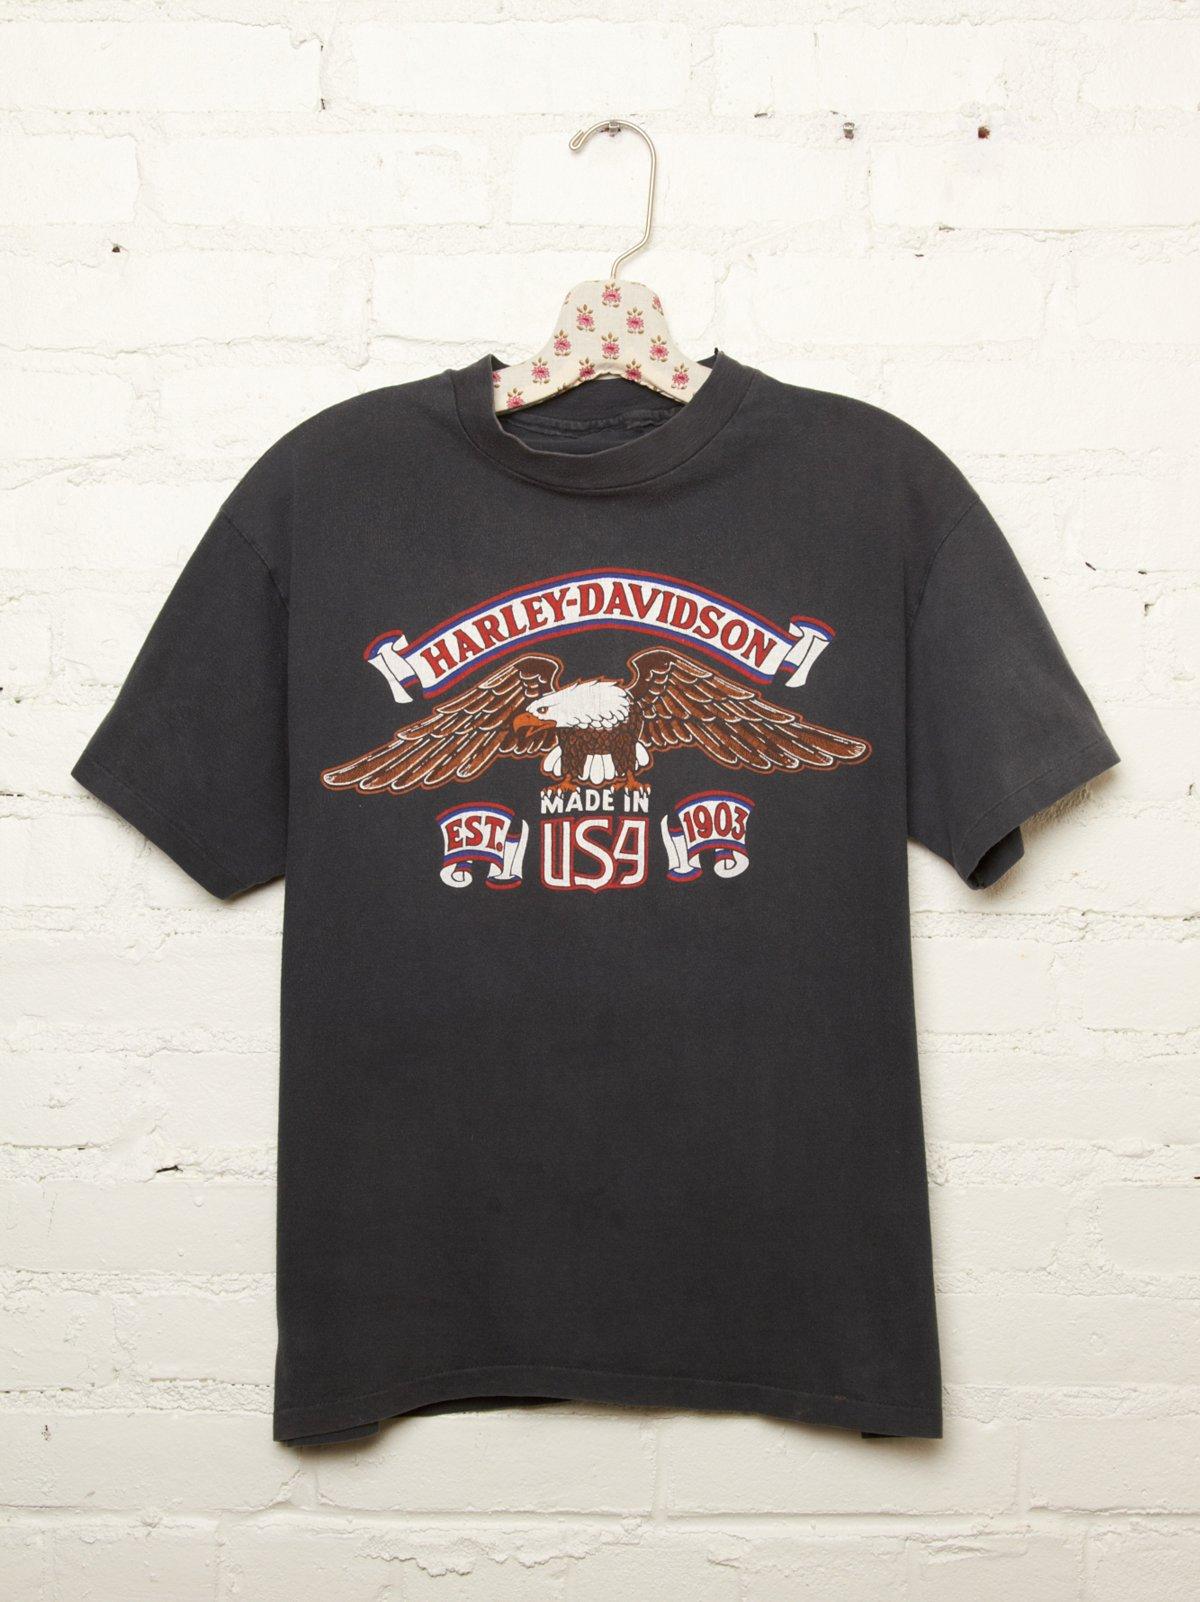 Vintage Harley Davidson Tee